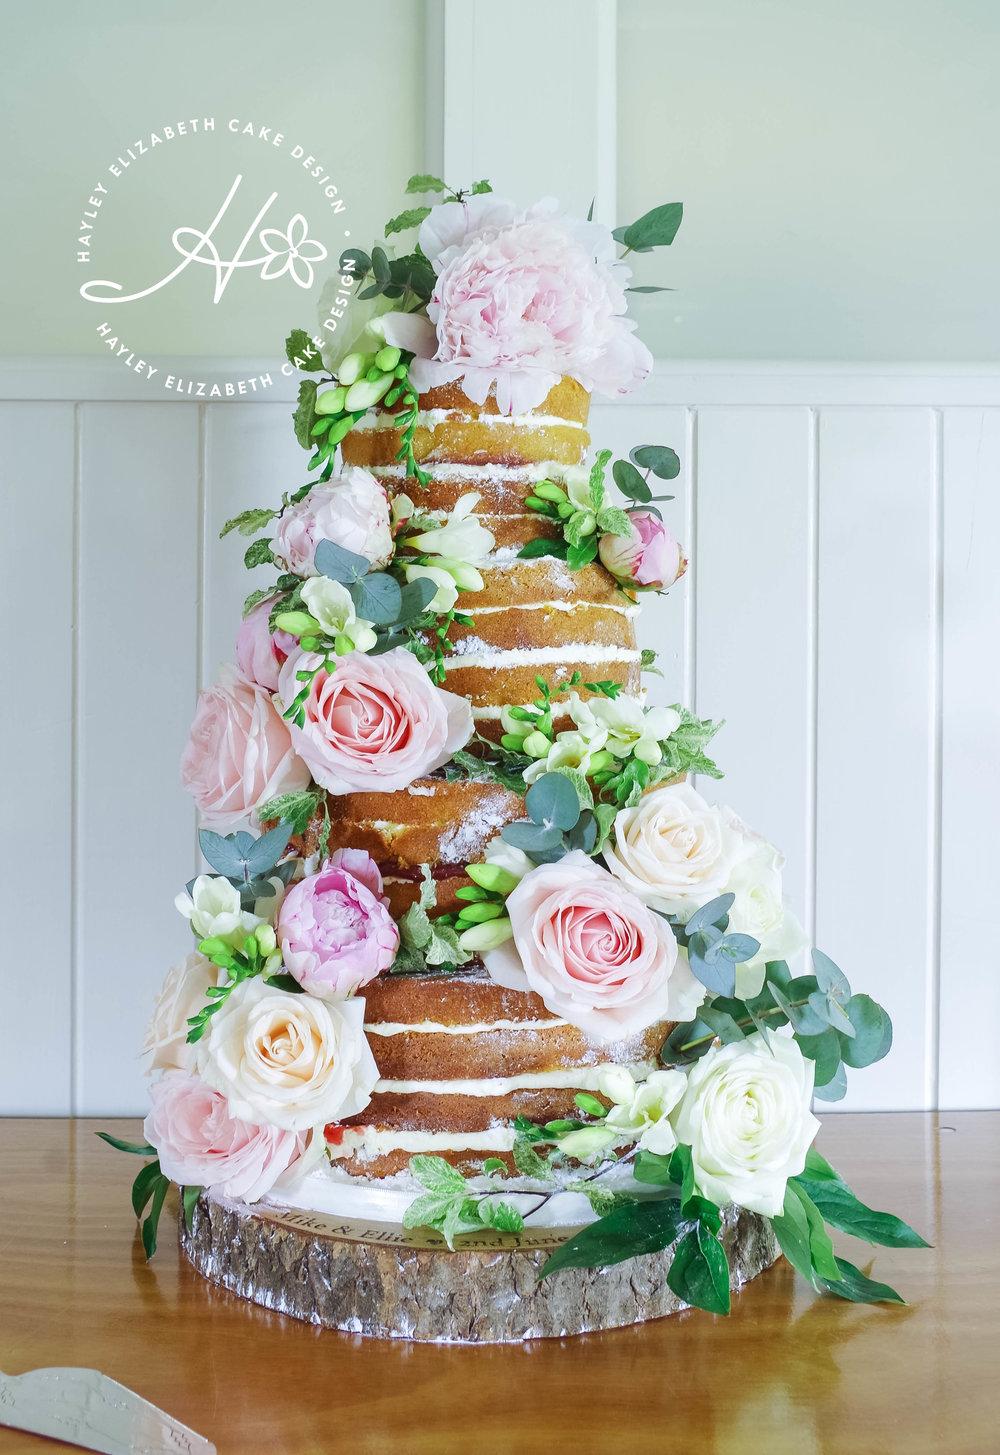 naked-wedding-cake-withfresh-flowers.jpg